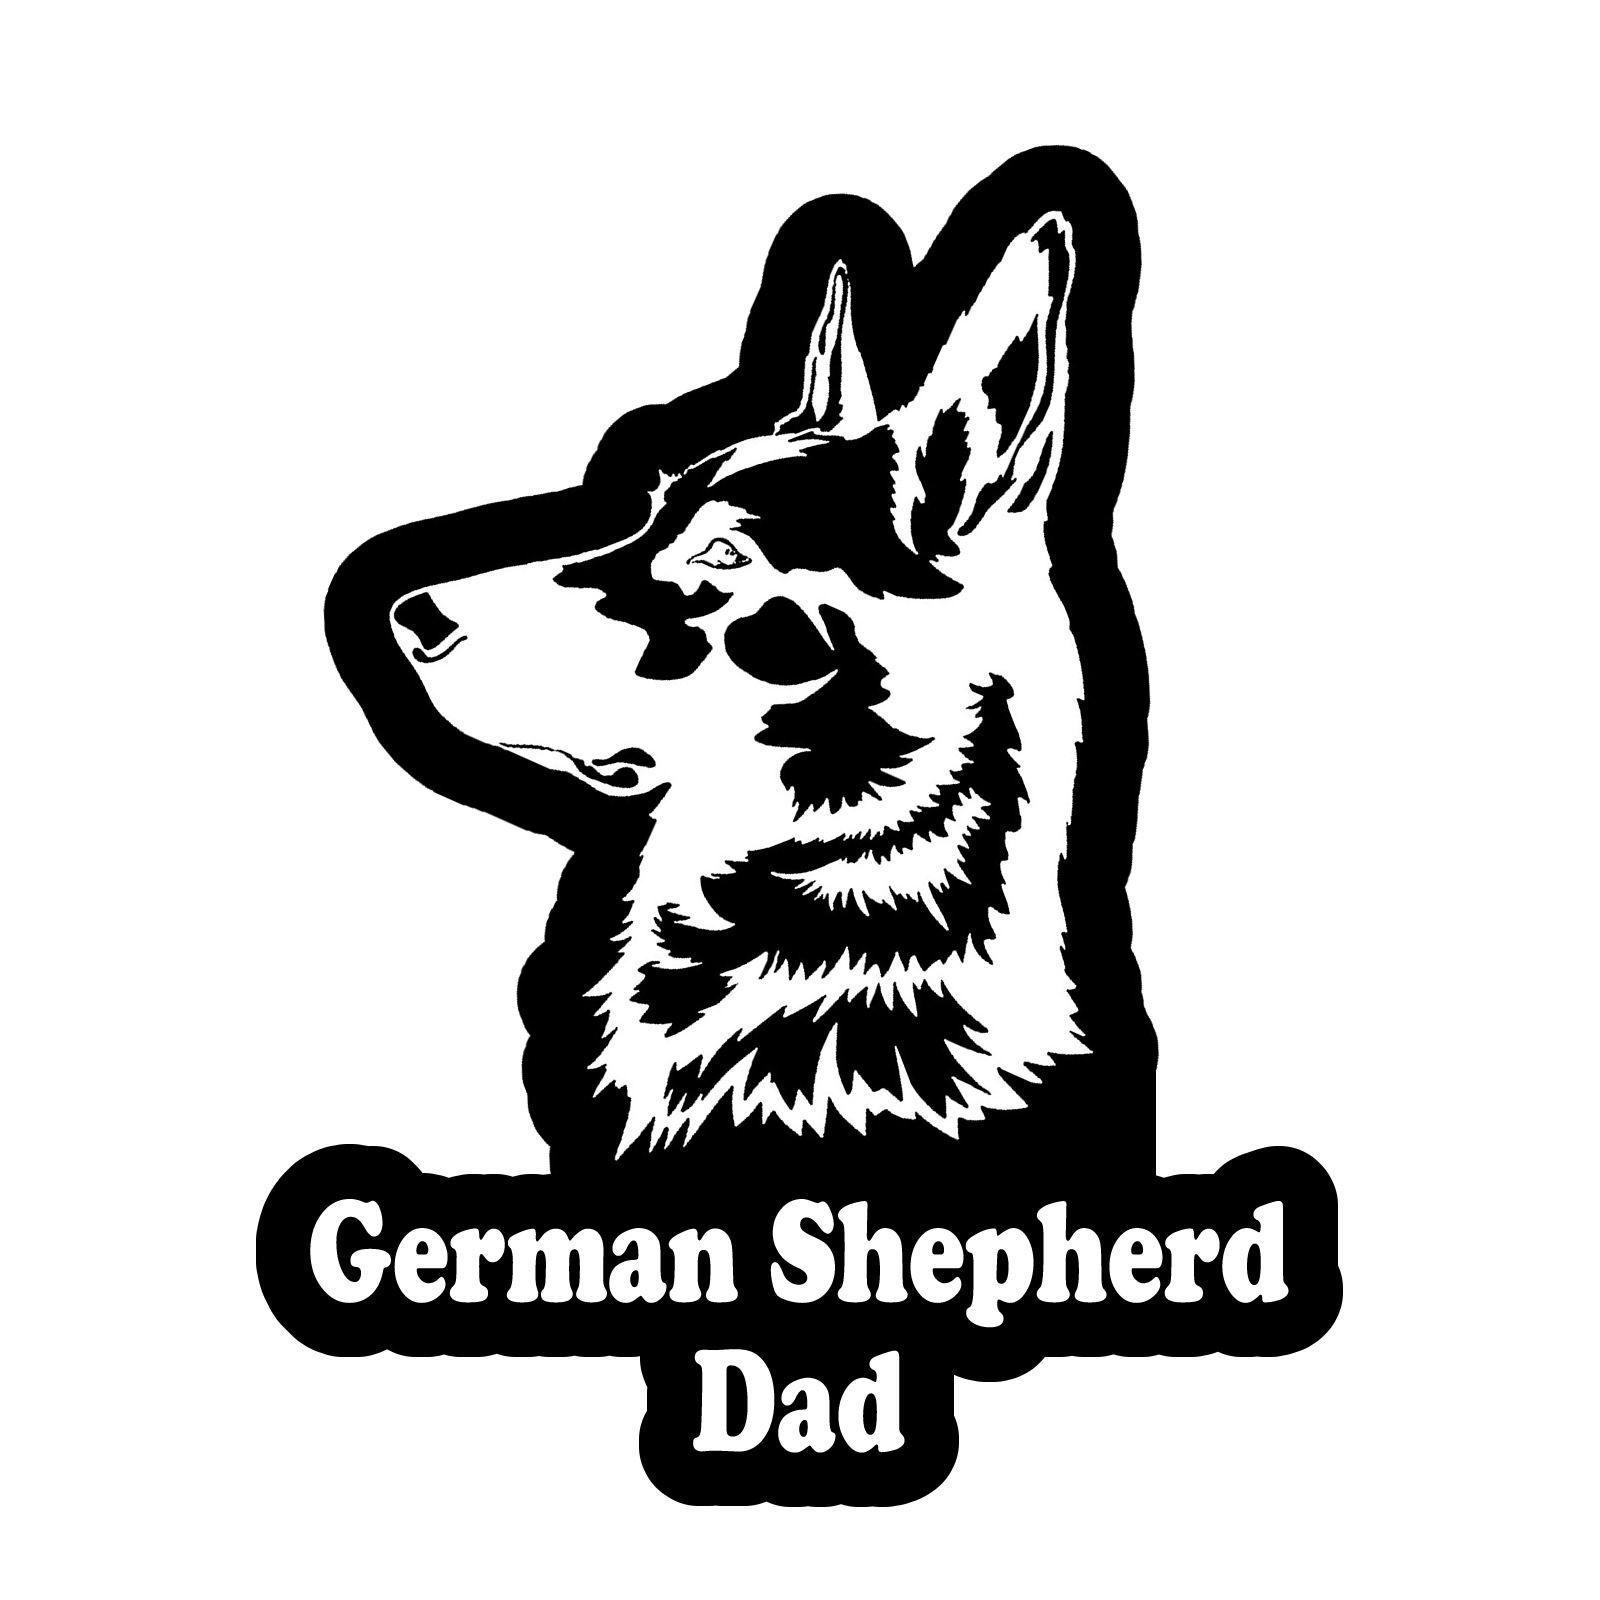 2 99 German Shepherd Dad Decal Sticker Car Window Bumper 4 Inches Fc3345 Ebay Home Garden Germanshepherd German Shepherd Shepherd German [ 1600 x 1600 Pixel ]